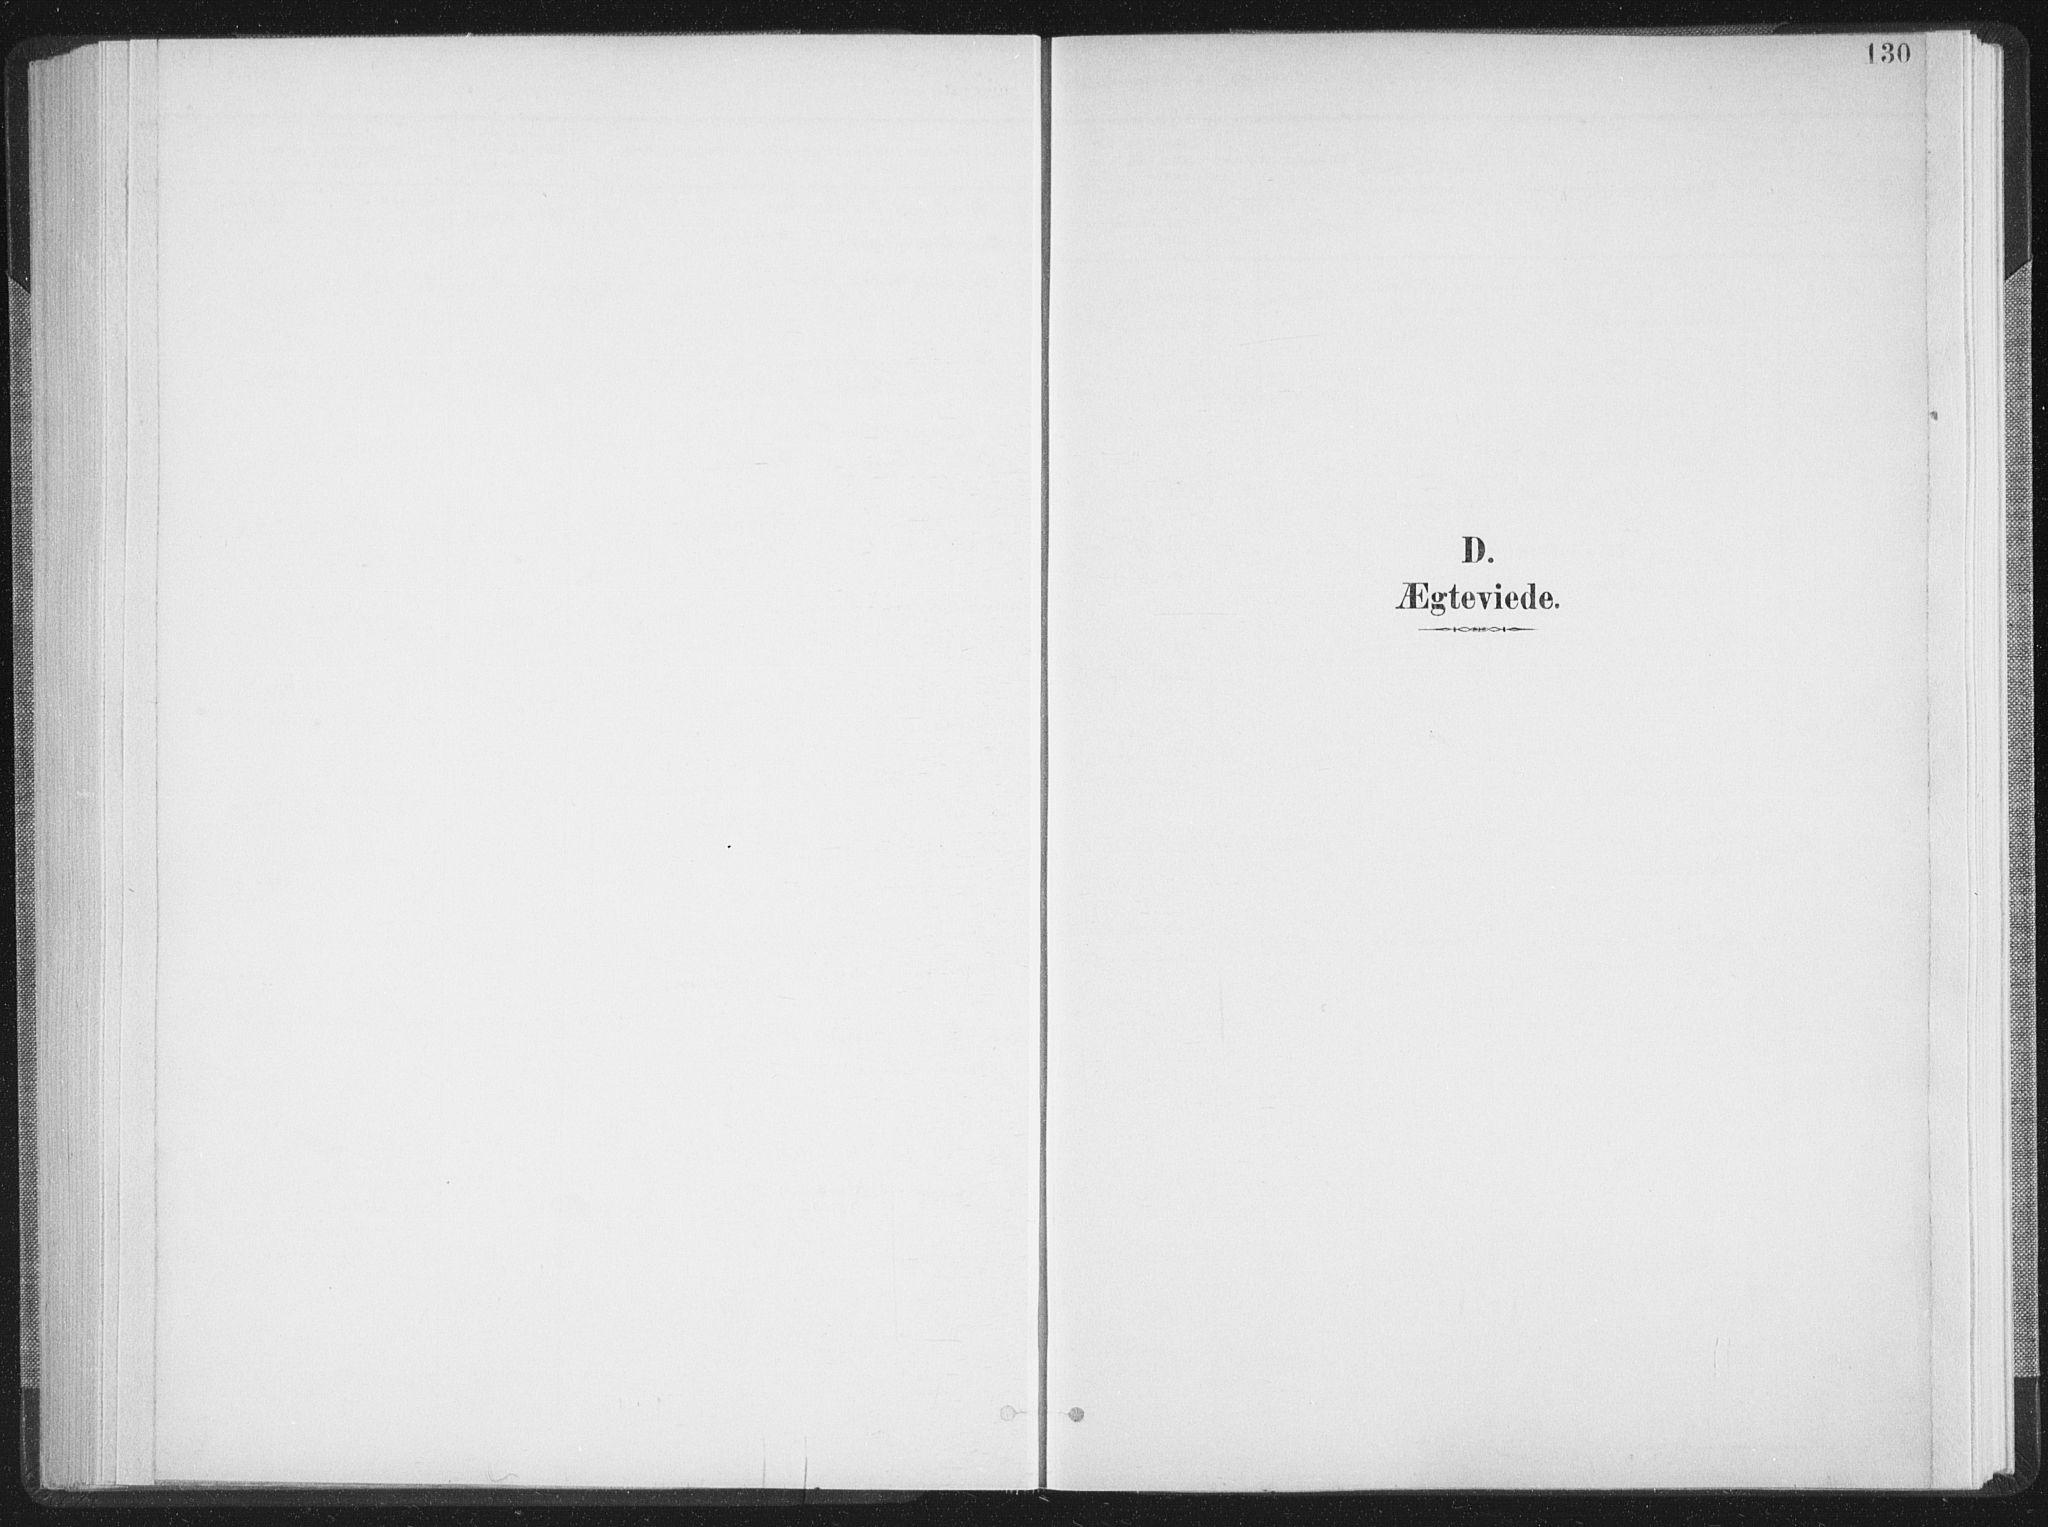 SAT, Ministerialprotokoller, klokkerbøker og fødselsregistre - Nordland, 897/L1400: Ministerialbok nr. 897A07, 1897-1908, s. 130